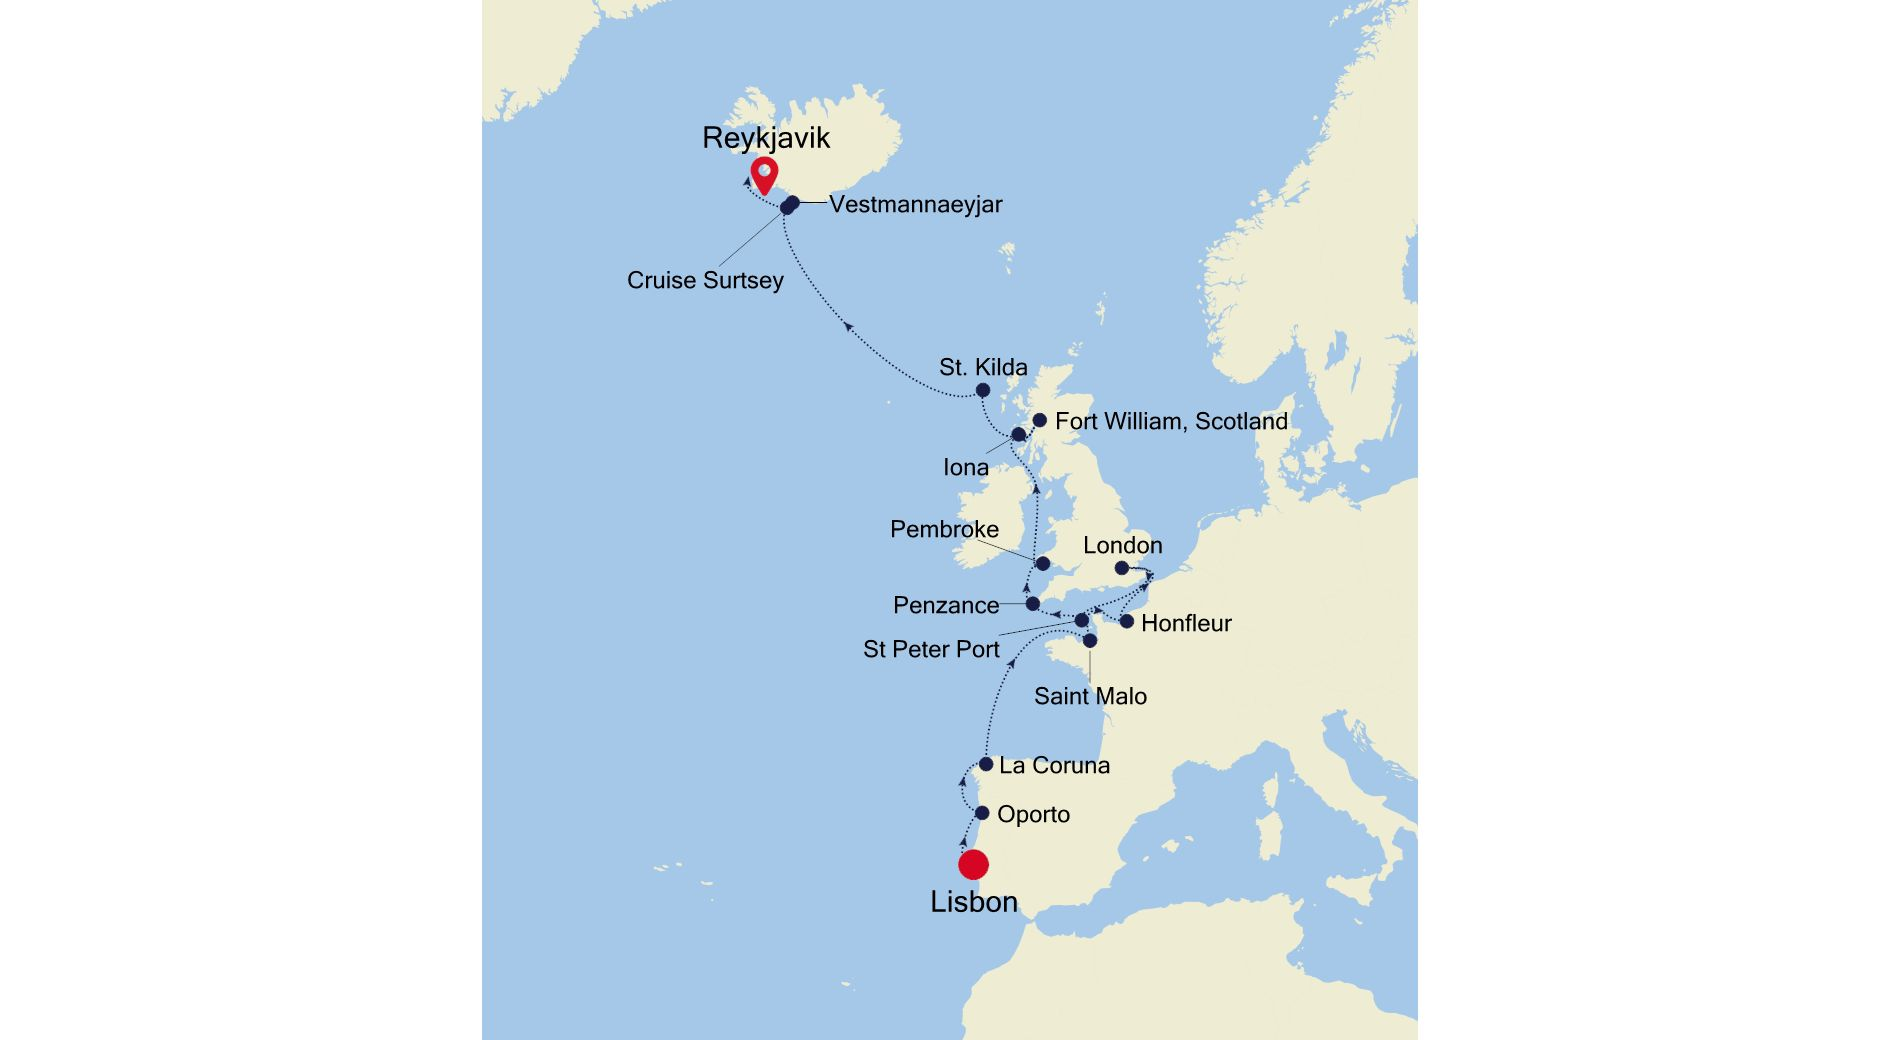 E4210616017 - Lisbon to Reykjavik